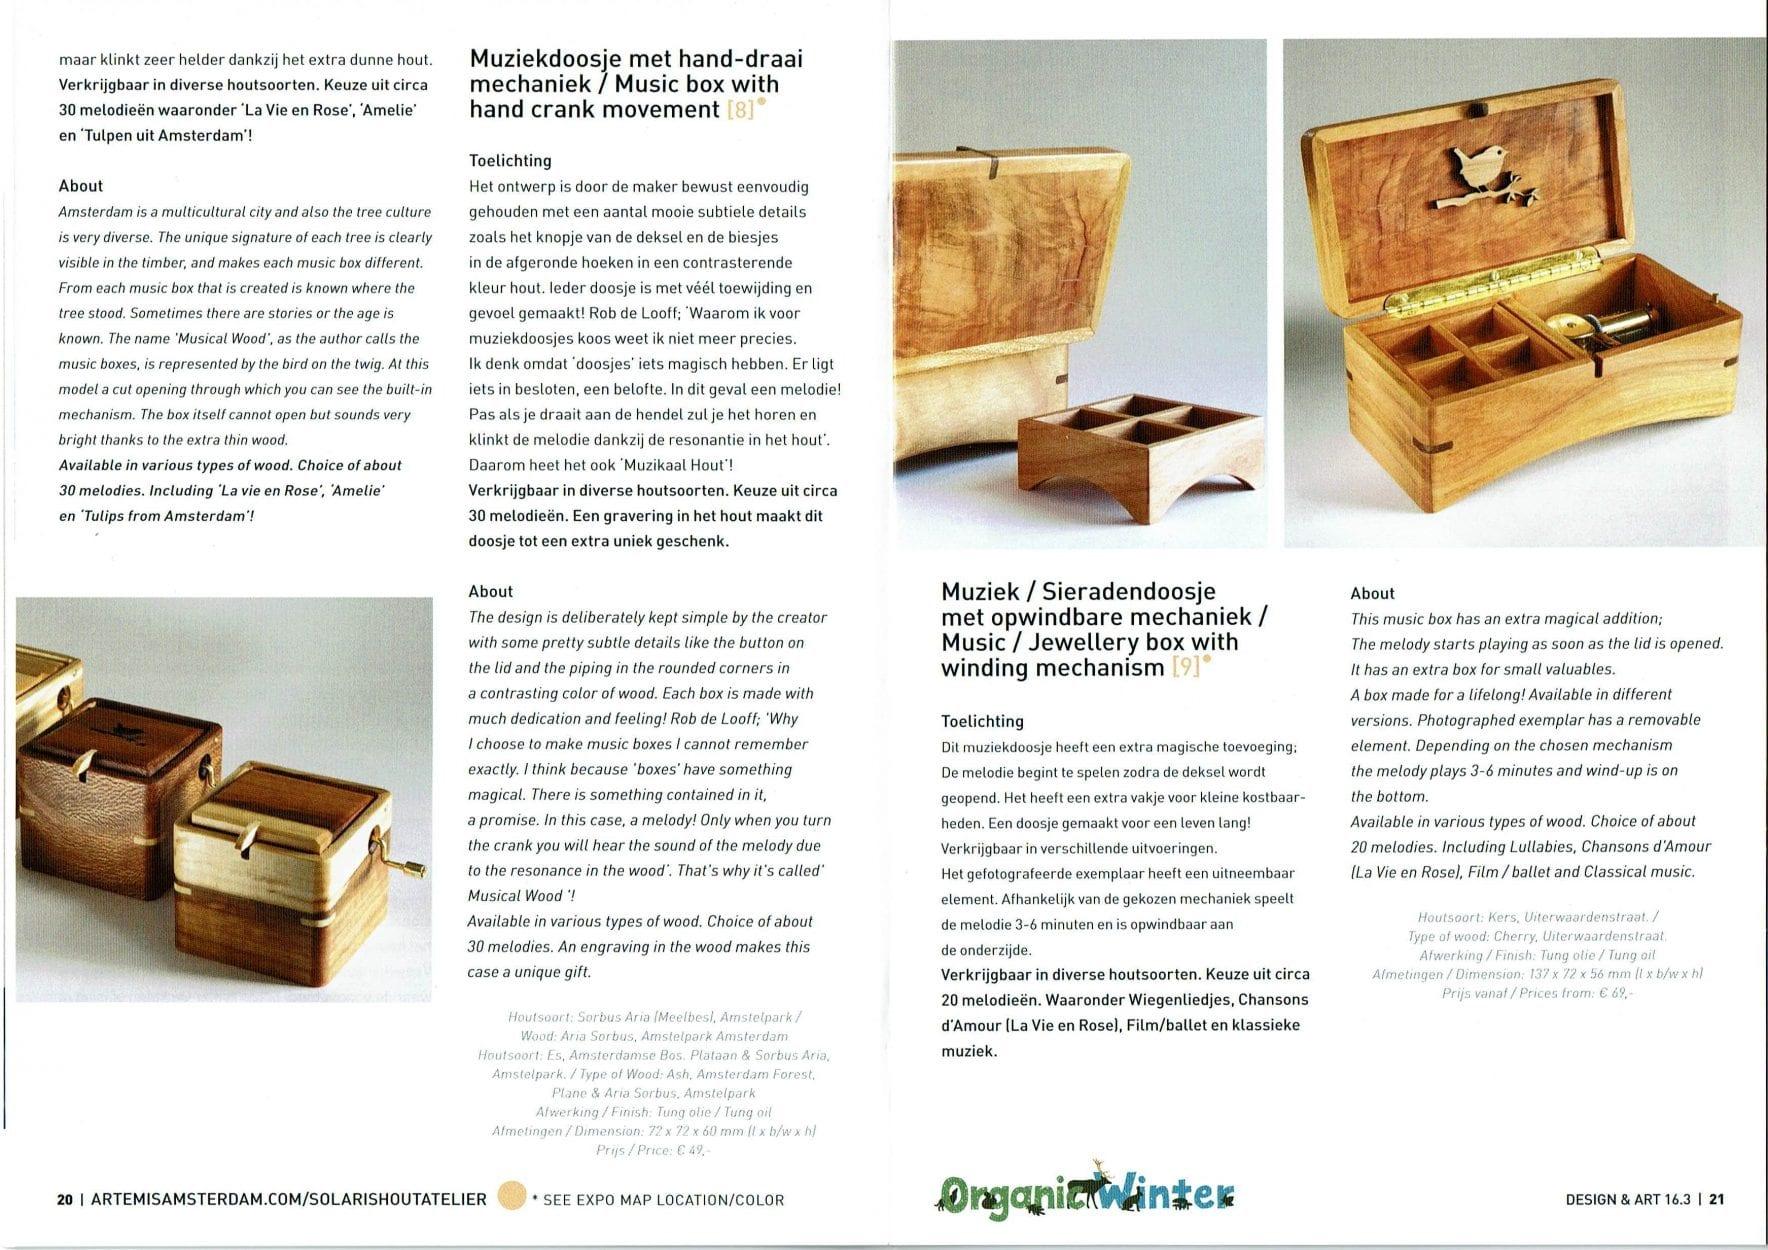 Dutch Design Hotel Expo Music Boxes